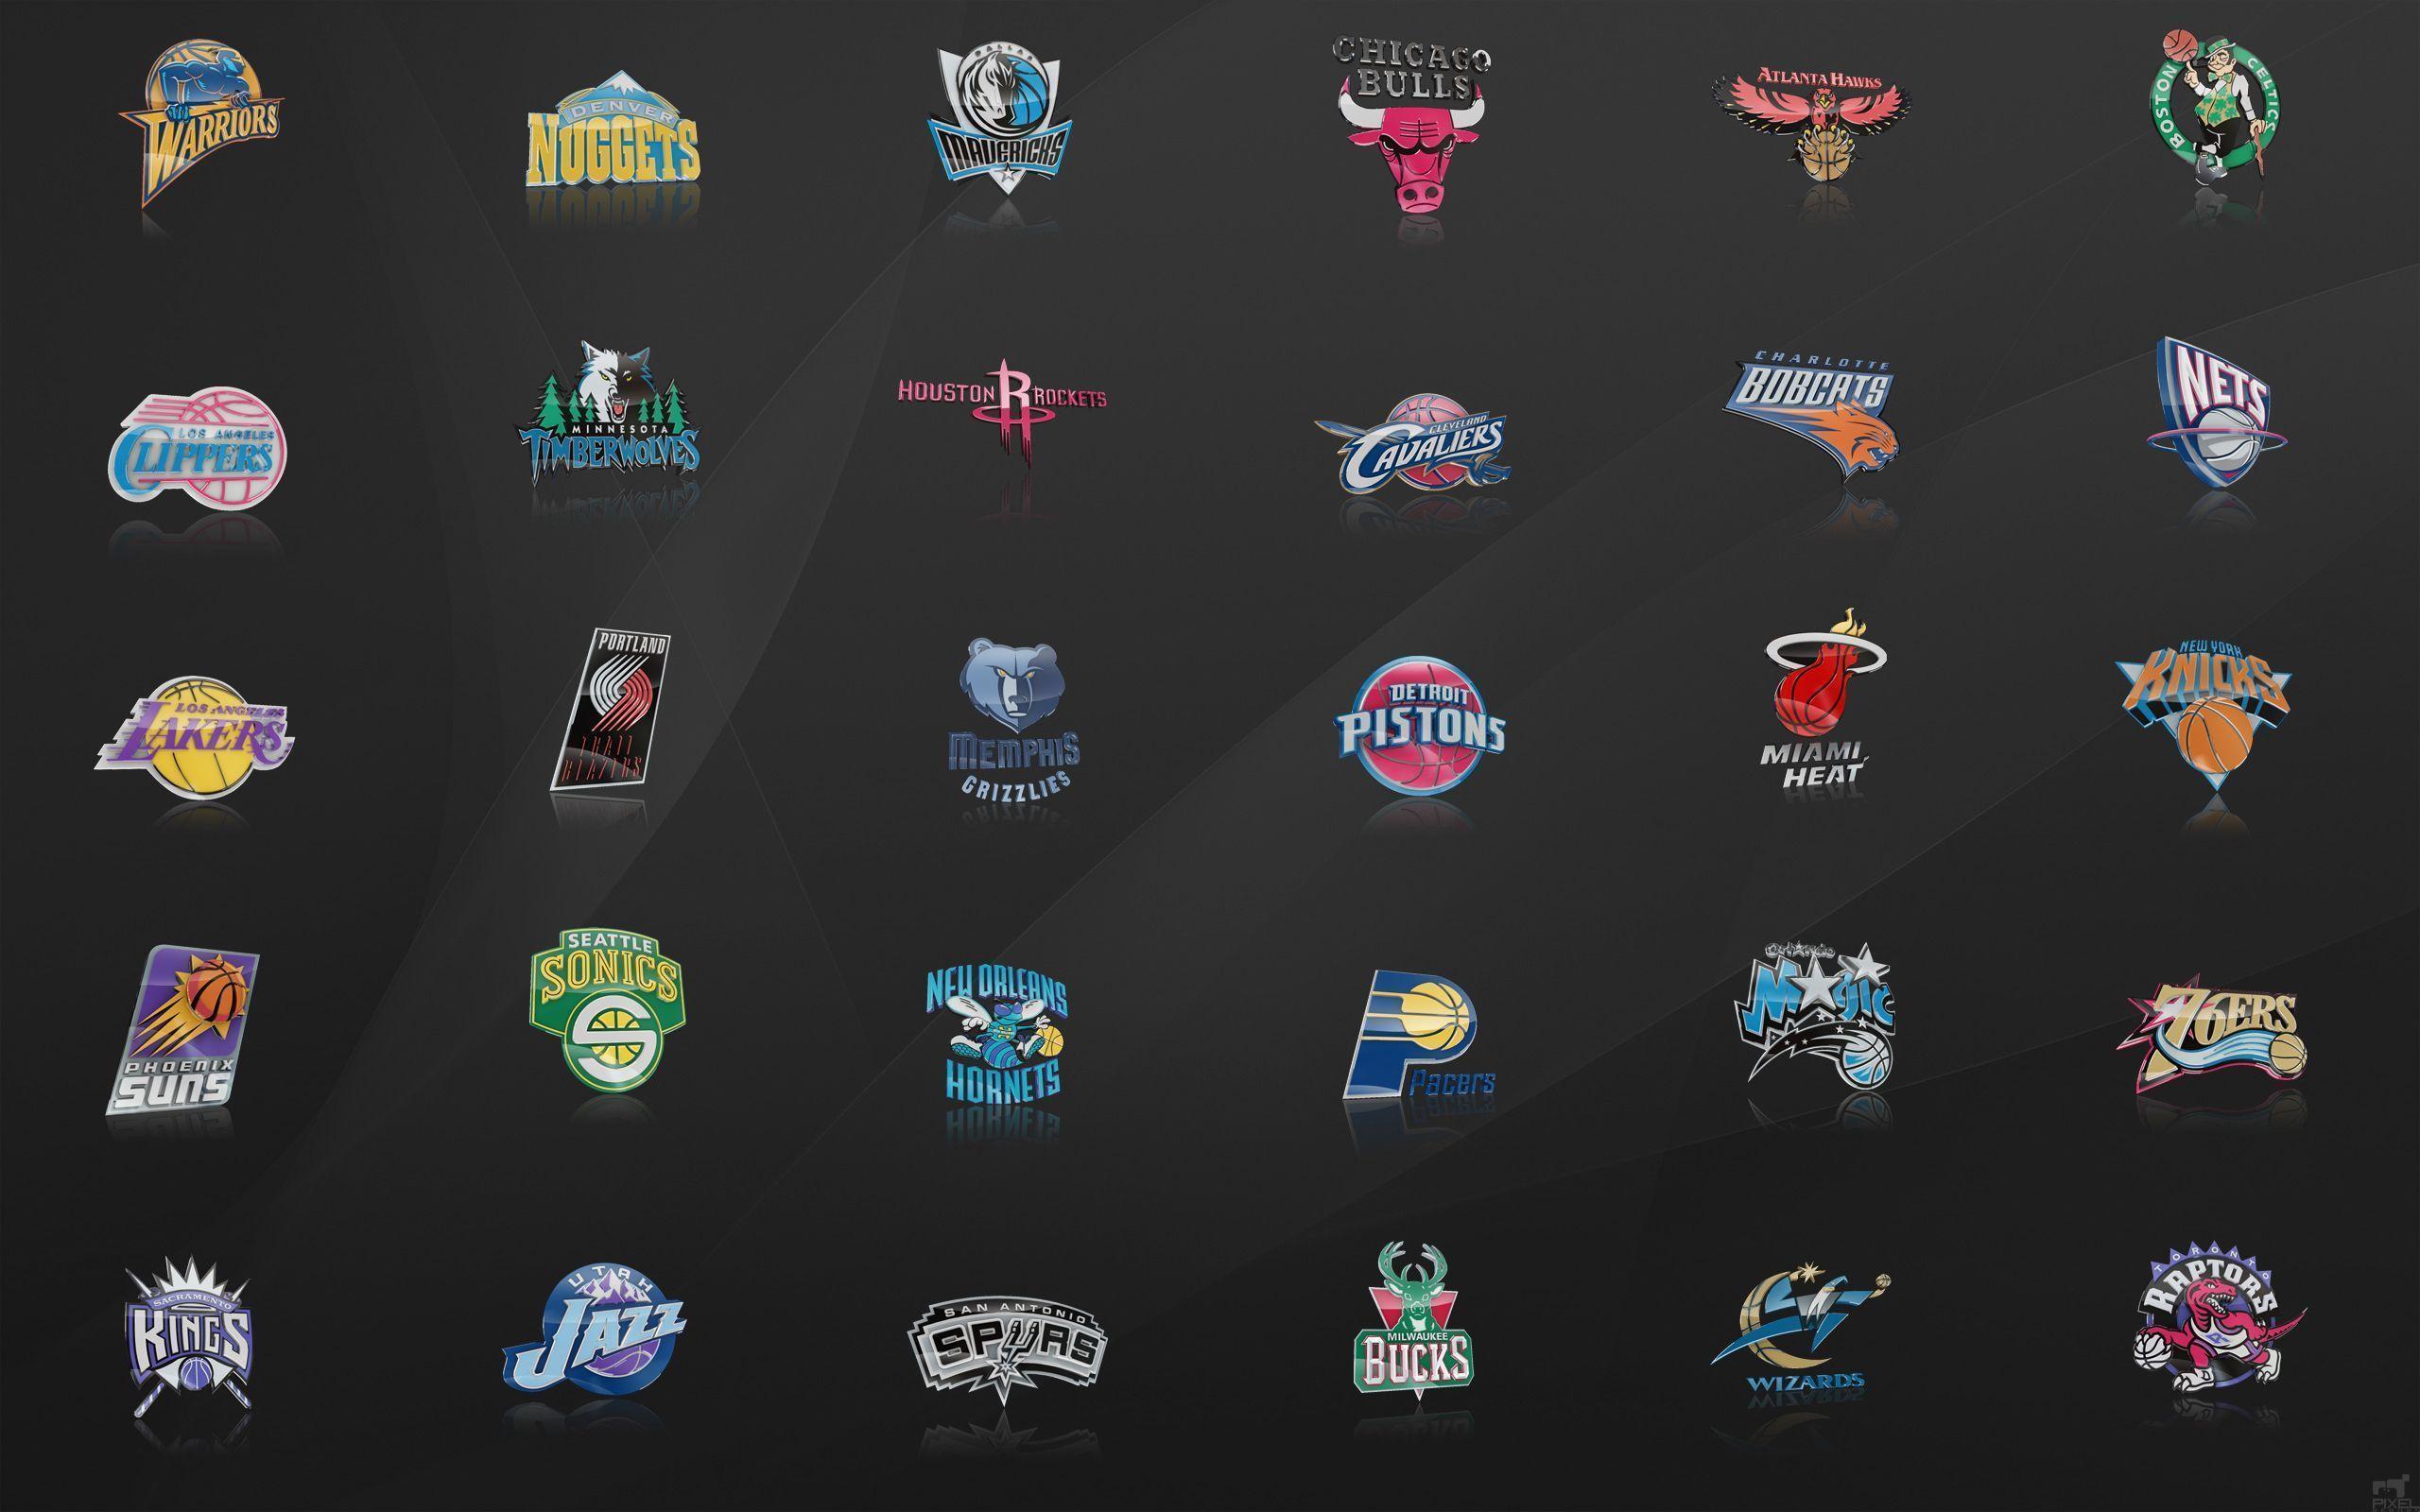 Nba Team Logos Wallpapers 2016 Wallpaper Cave